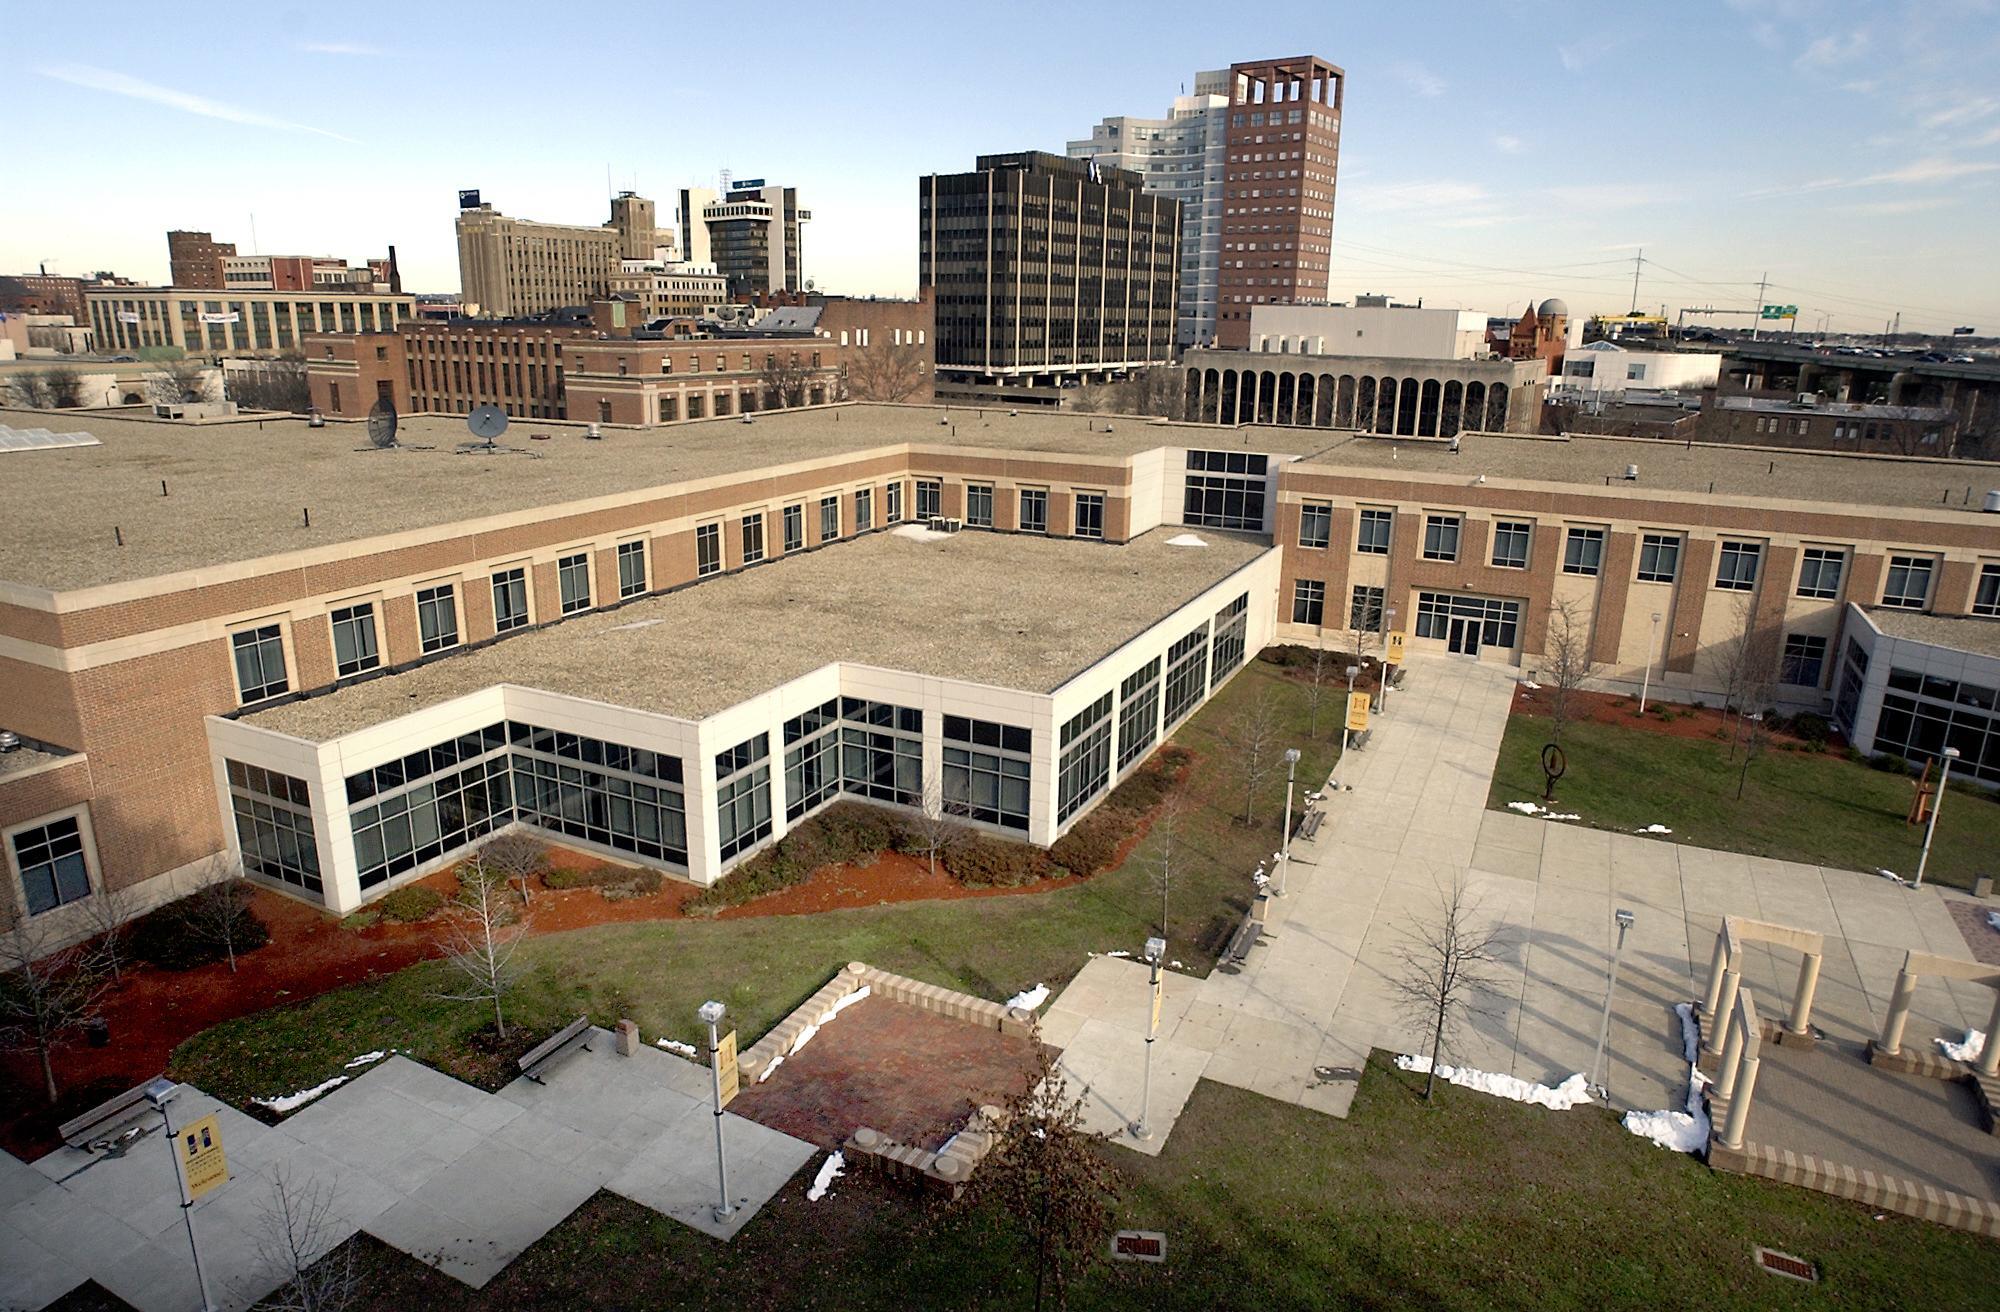 Gateway, Housatonic students could be guaranteed Quinnipiac admission under partnership